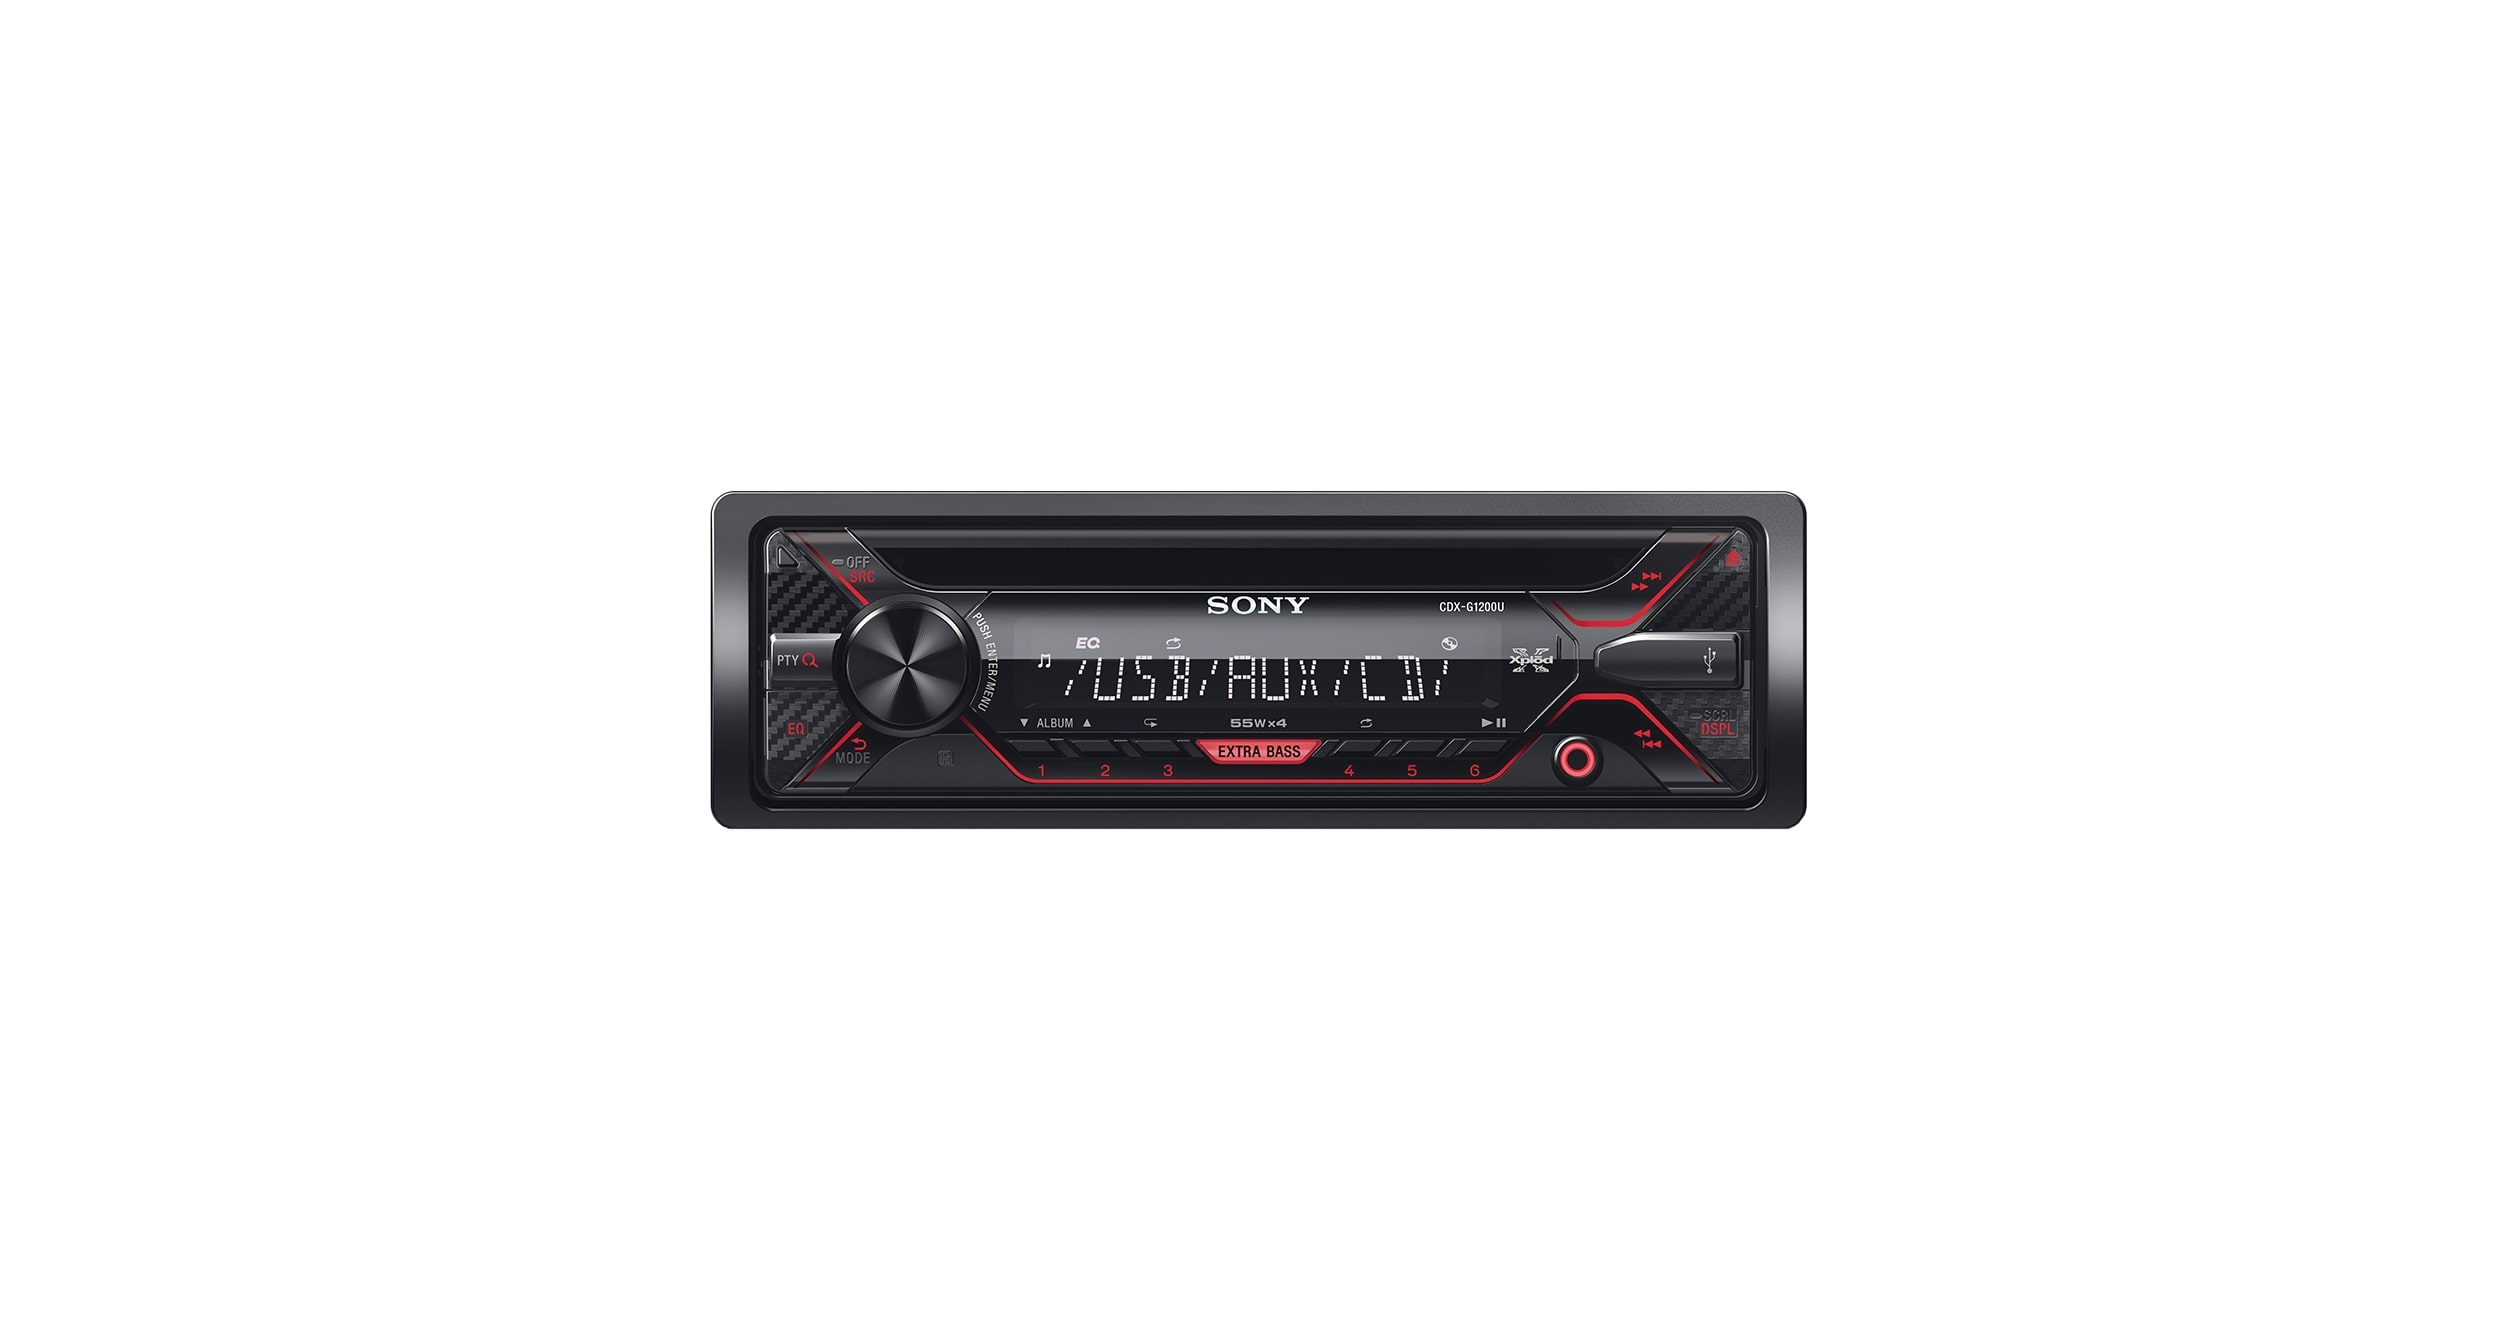 Sony CDX-G1200U CD Receiver